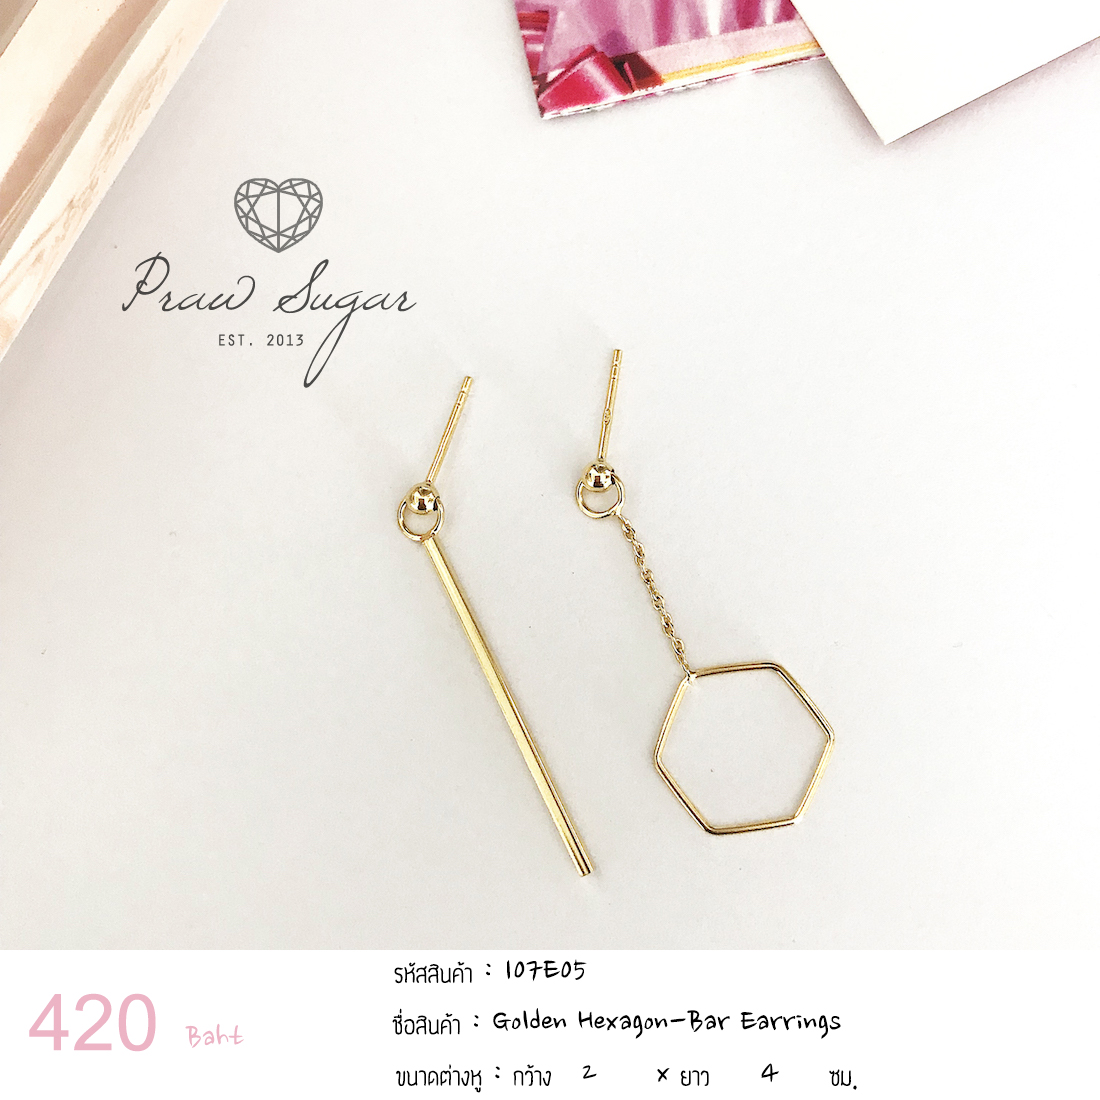 Golden Hexagon-Bar Earrings (เรือนทำจากเงินแท้) สำเนา